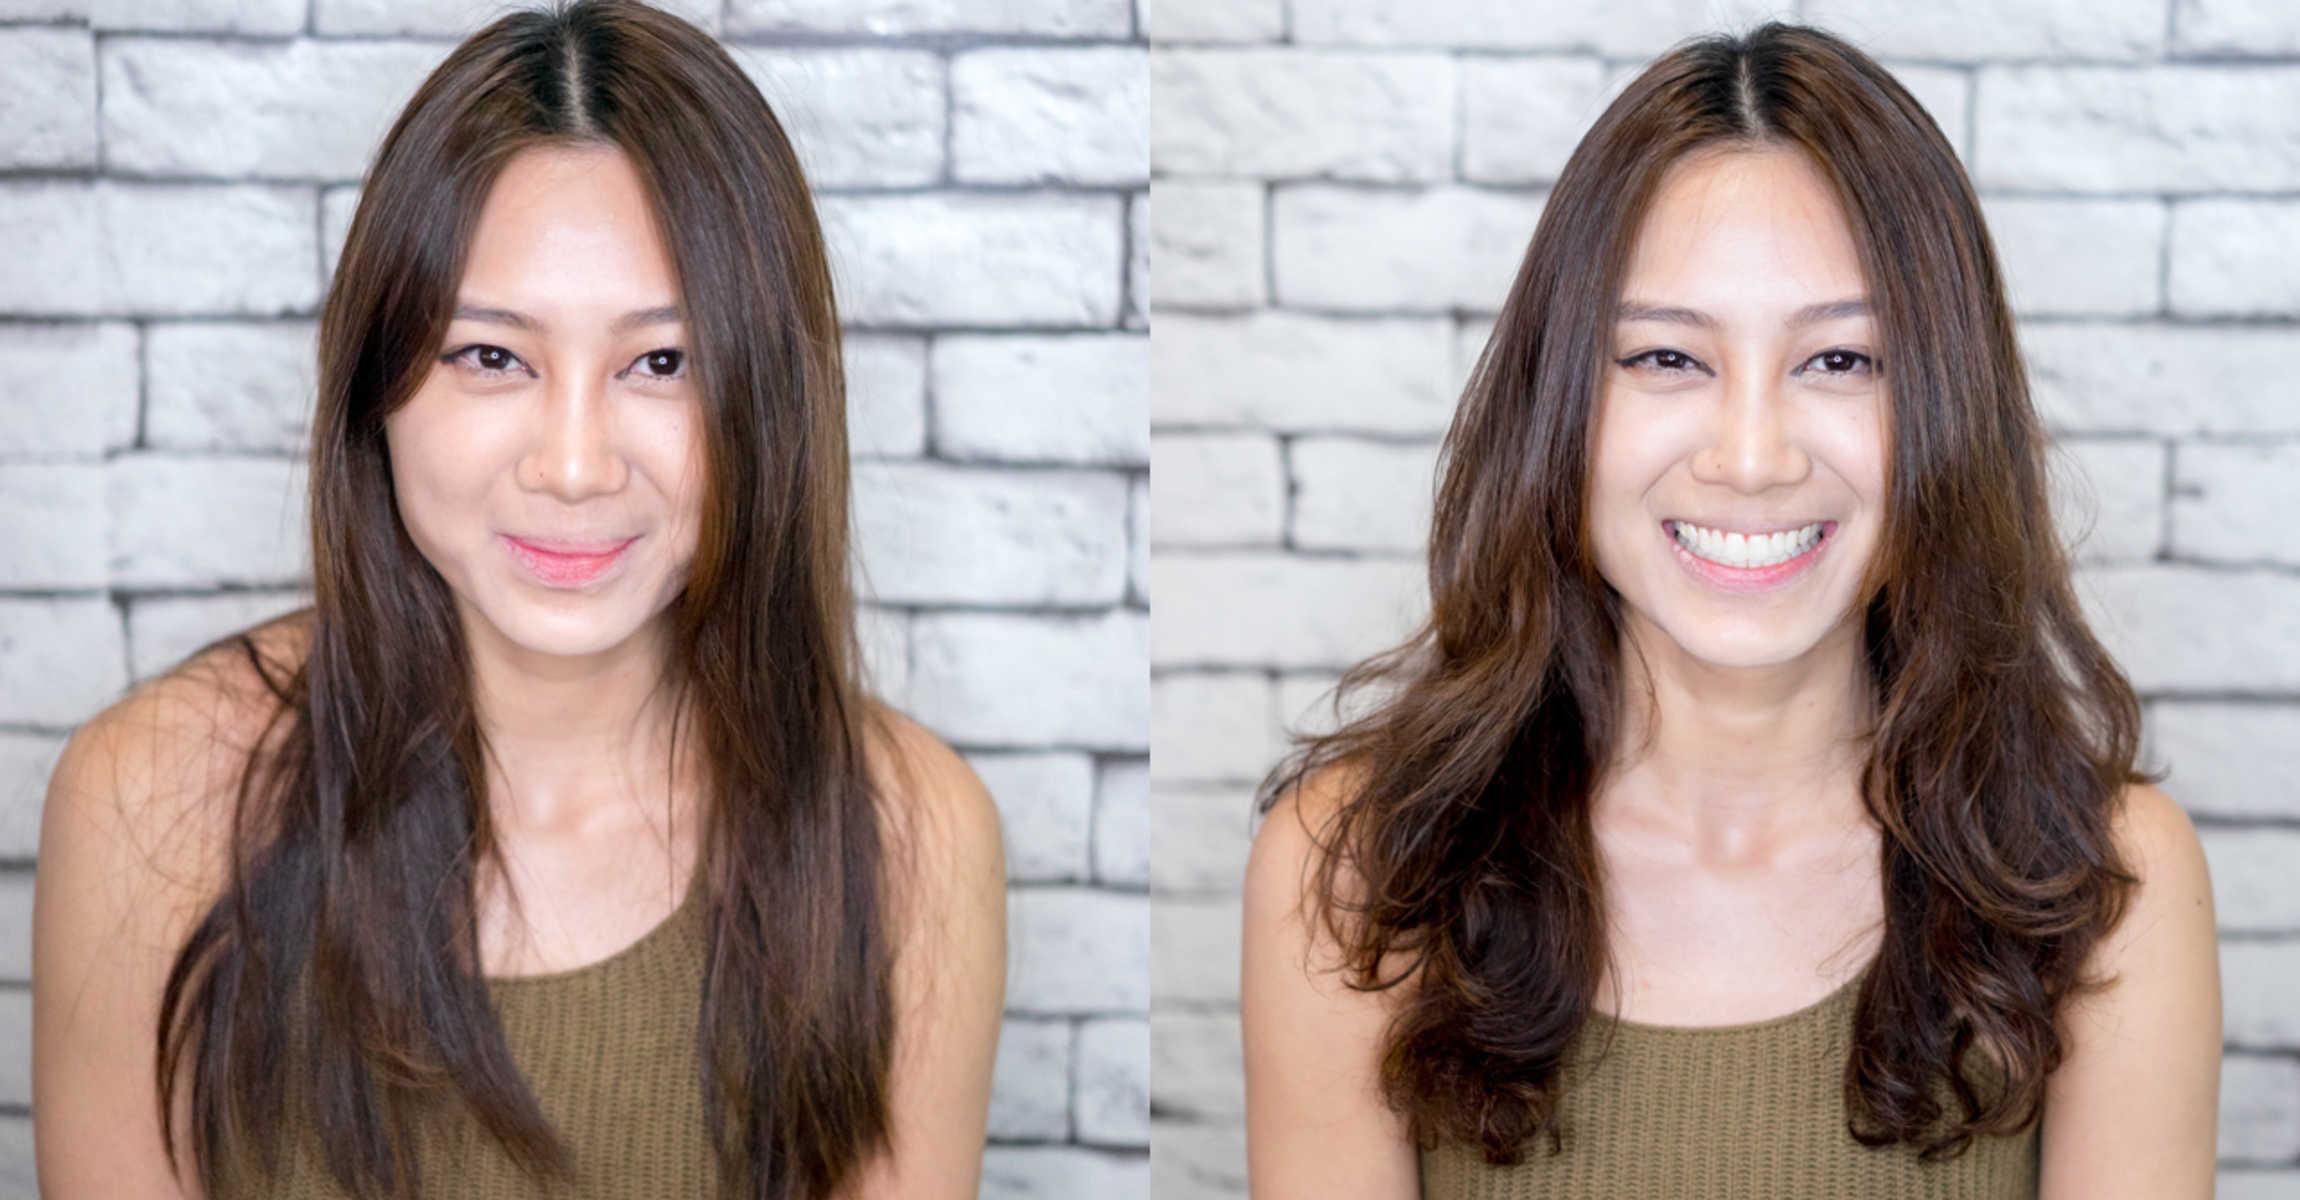 Graduate student jt got a korean volume perm on her fine for Actpoint salon review